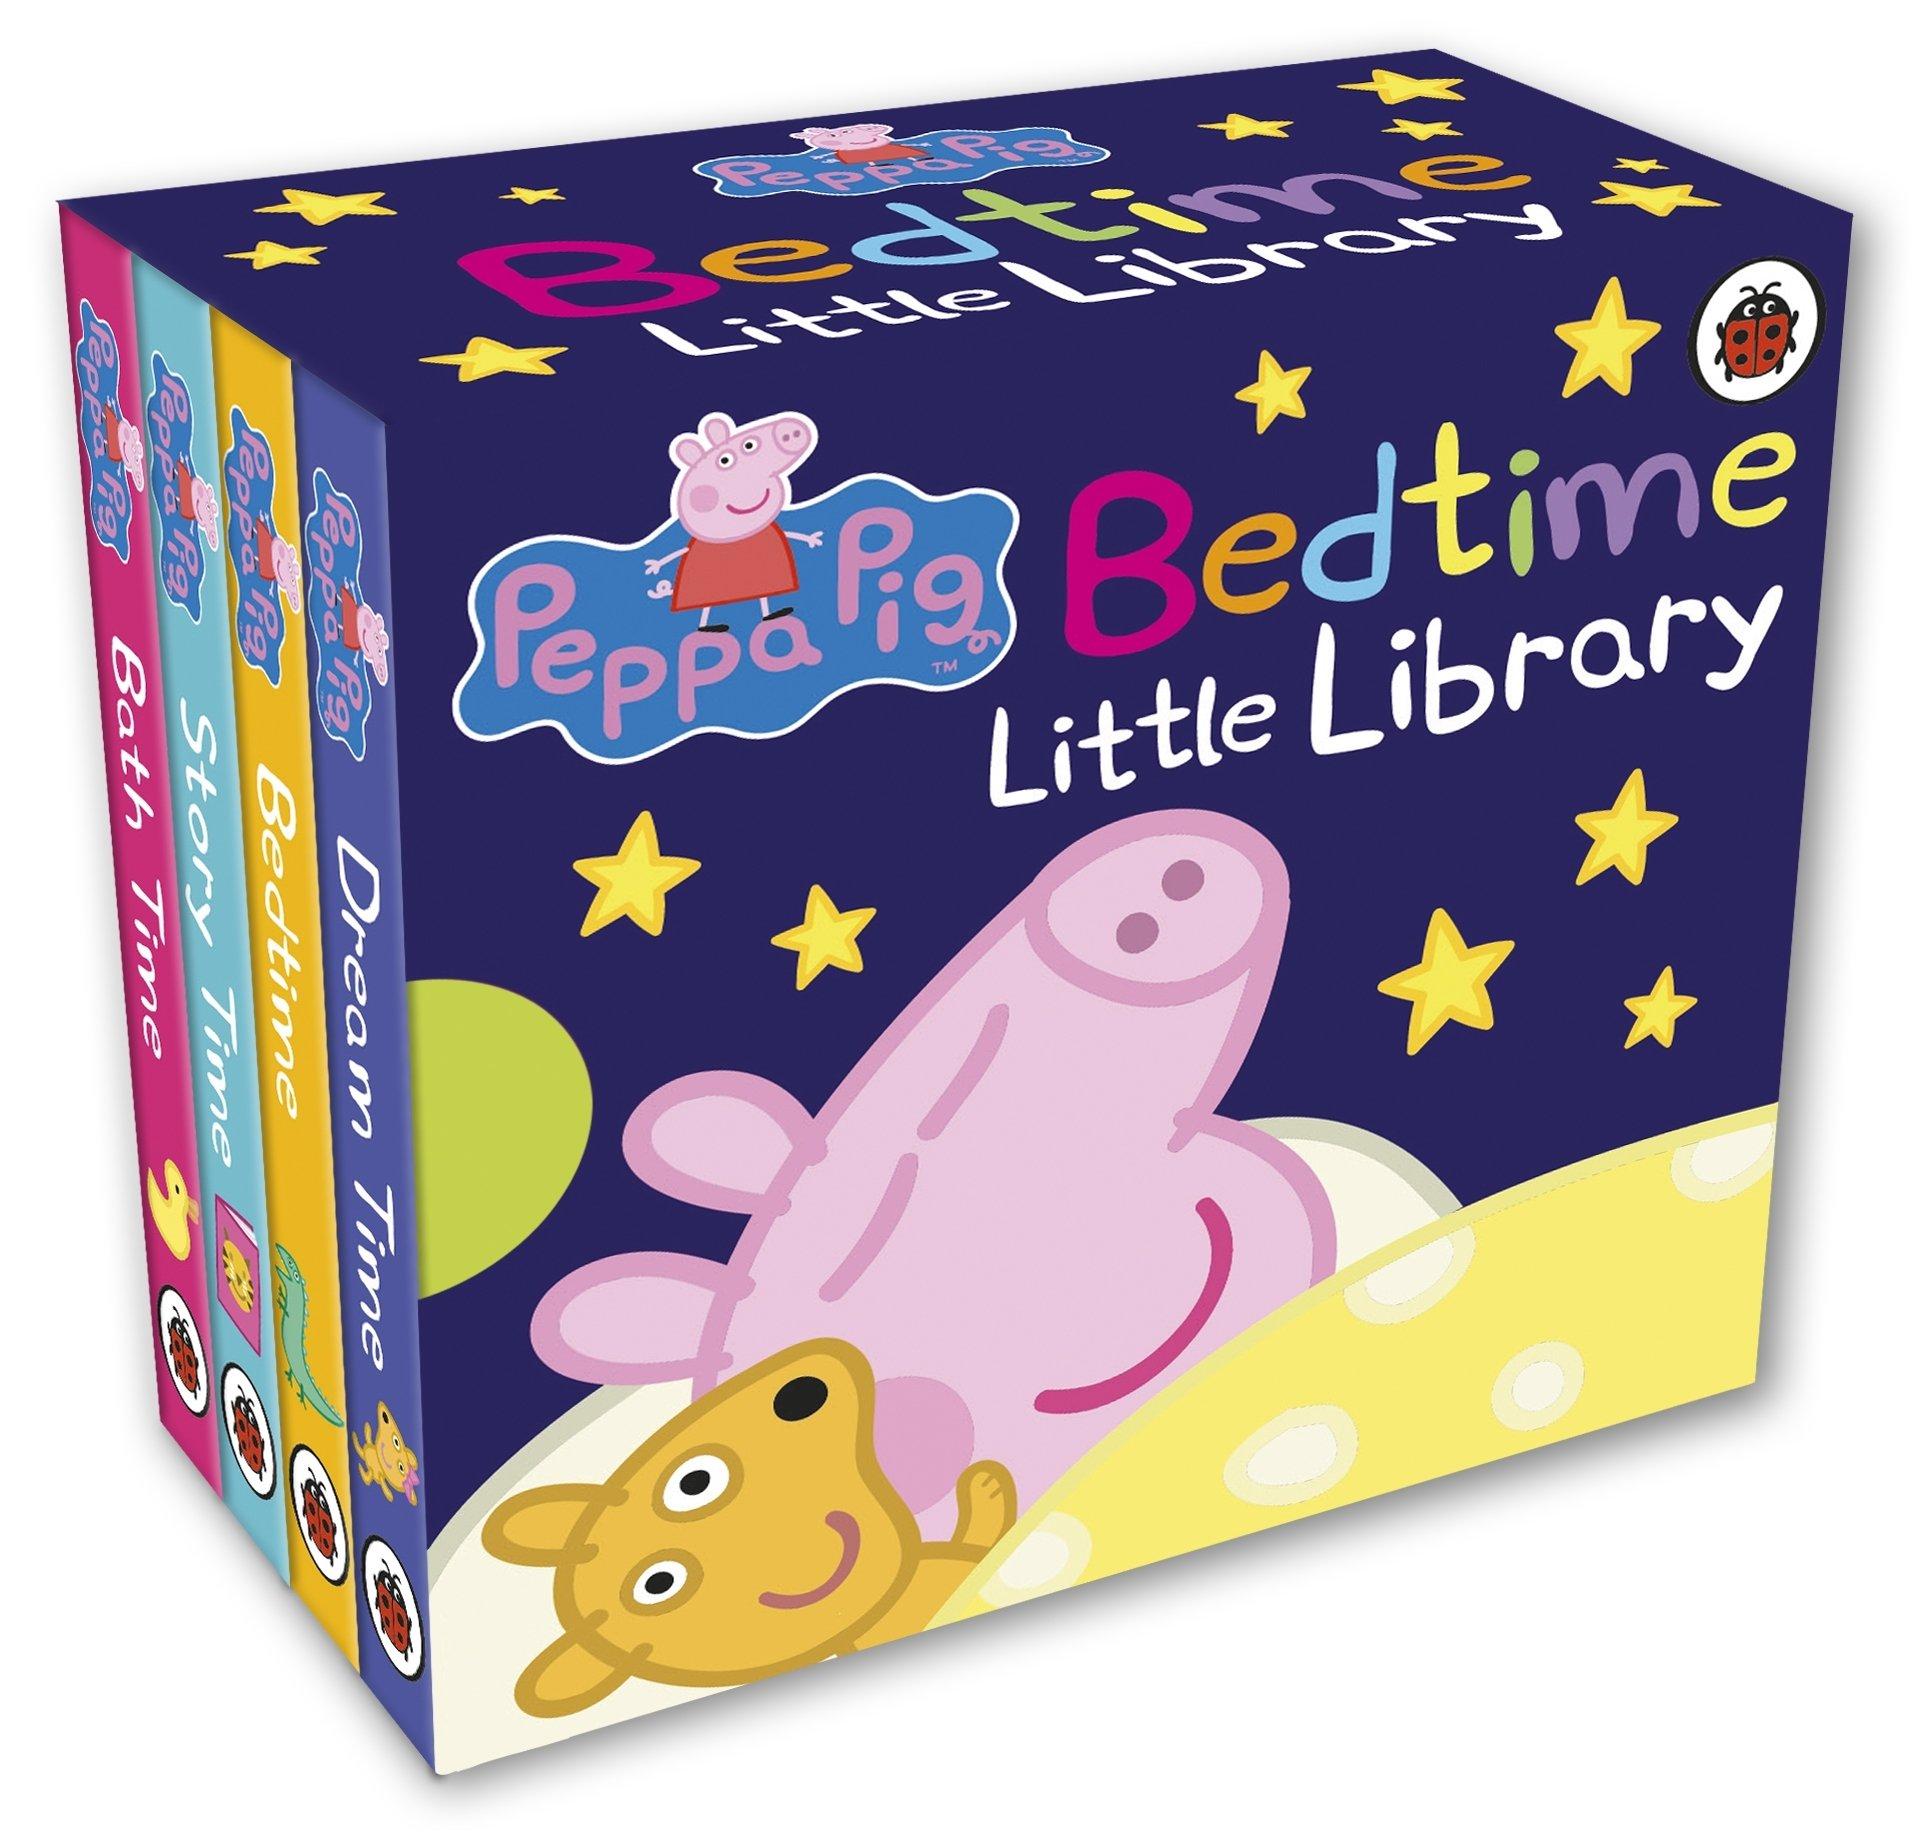 peppa-pig-bedtime-little-library